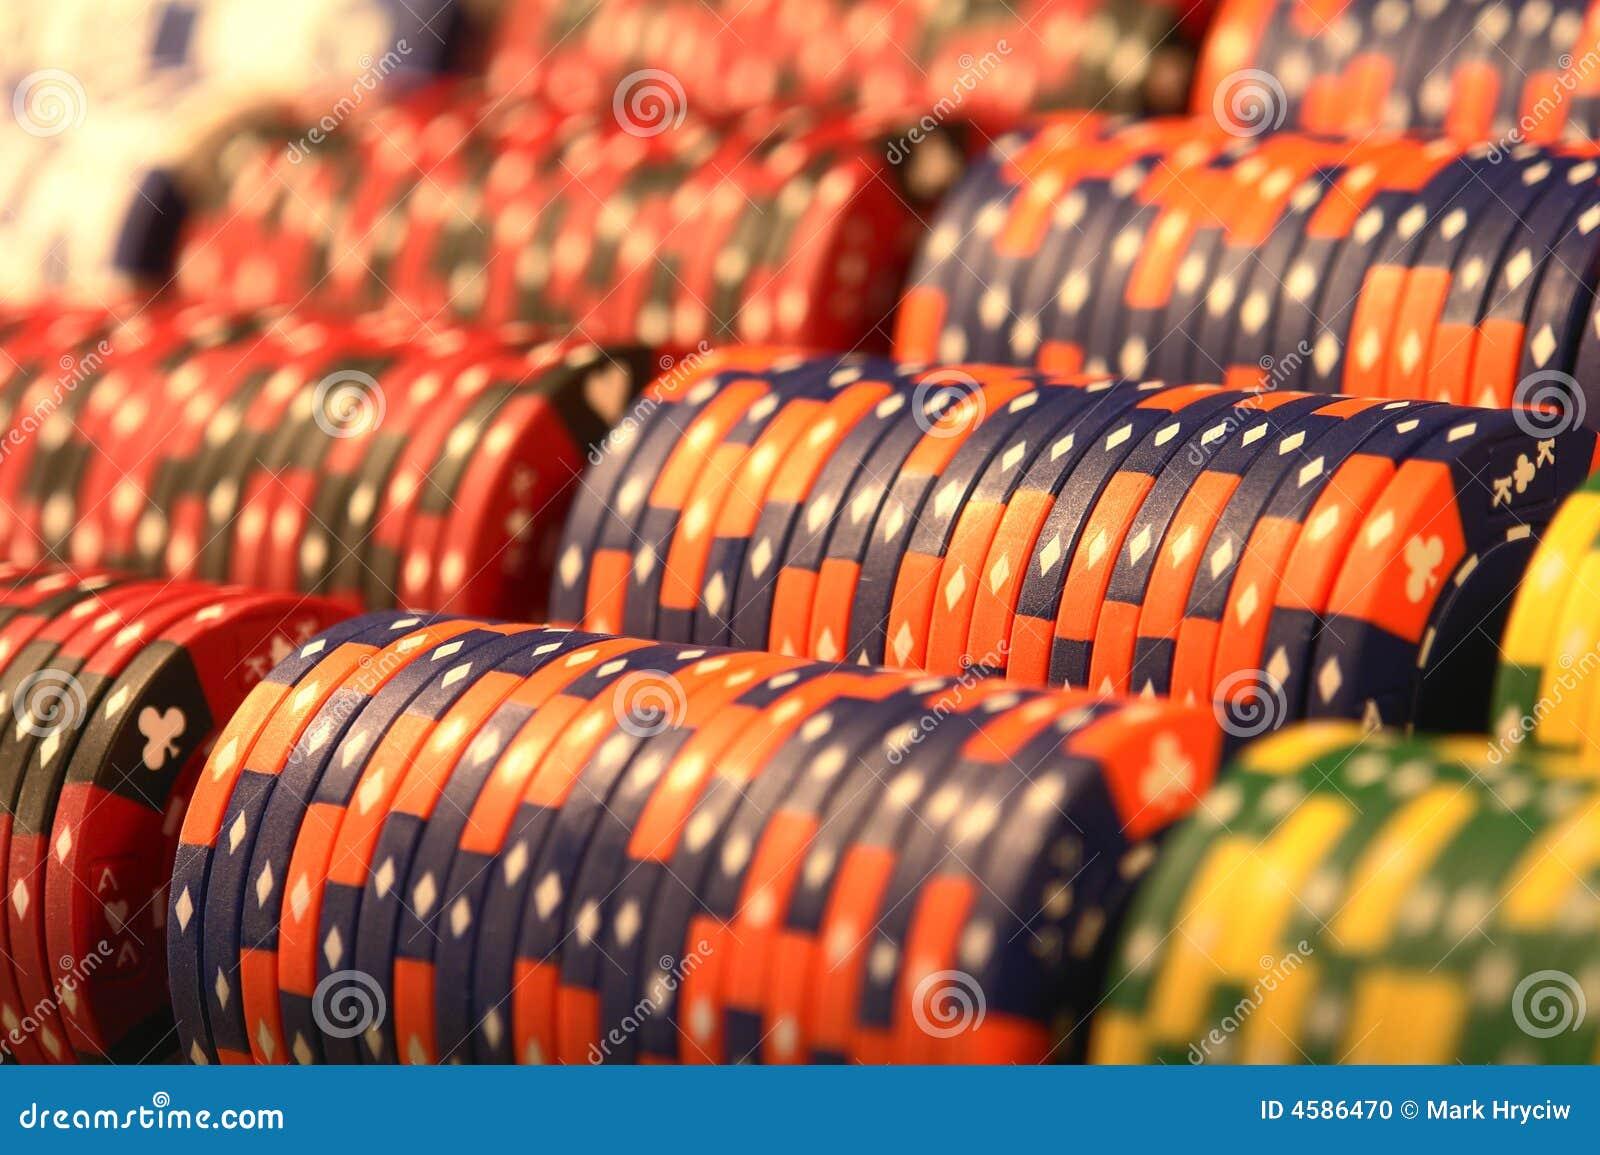 Used poker casino chips international water gambling